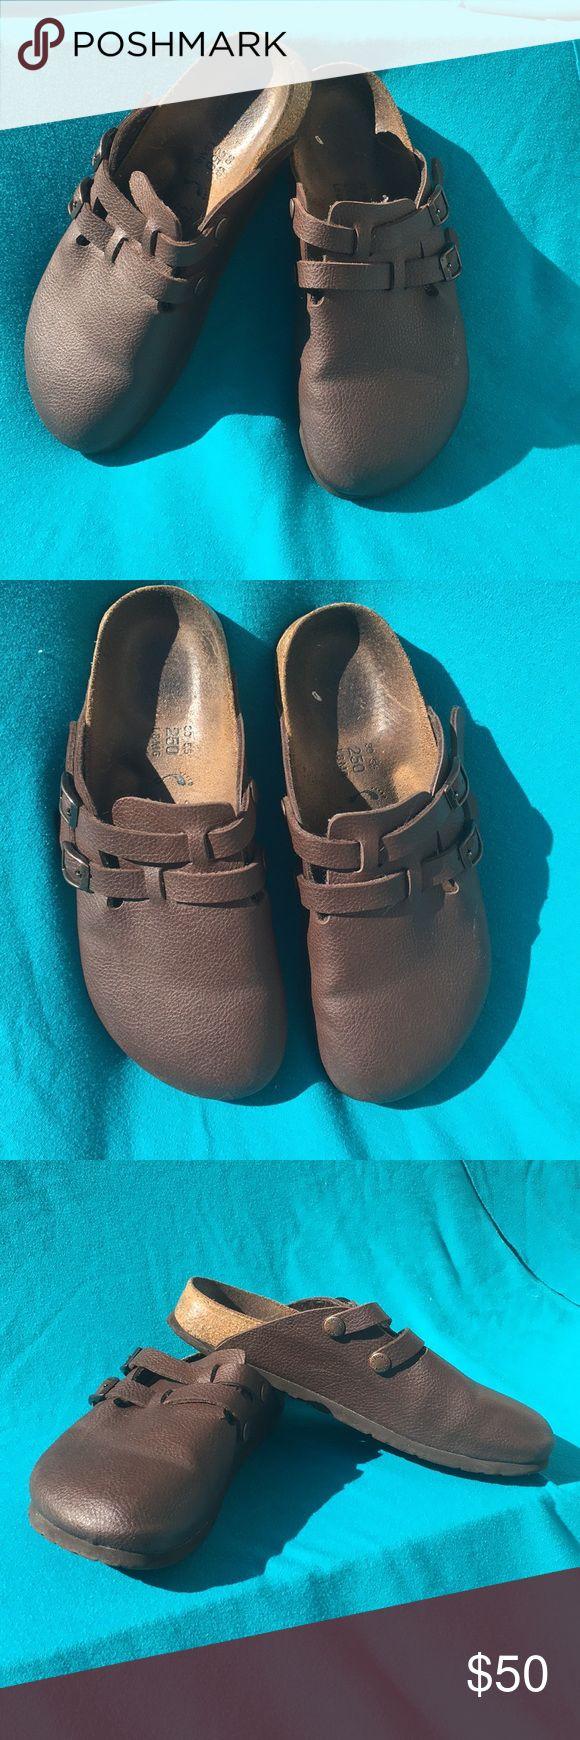 Birkenstock Brown Clogs Size Ladies 8 Men 6 EUC - Birkenstock brown Clogs. Ladies size 8 men size 6. Fits an 8.0-8.5 by Birkenstock sizing chart (euro size 39 on Birkenstock sizing) Birkenstock Shoes